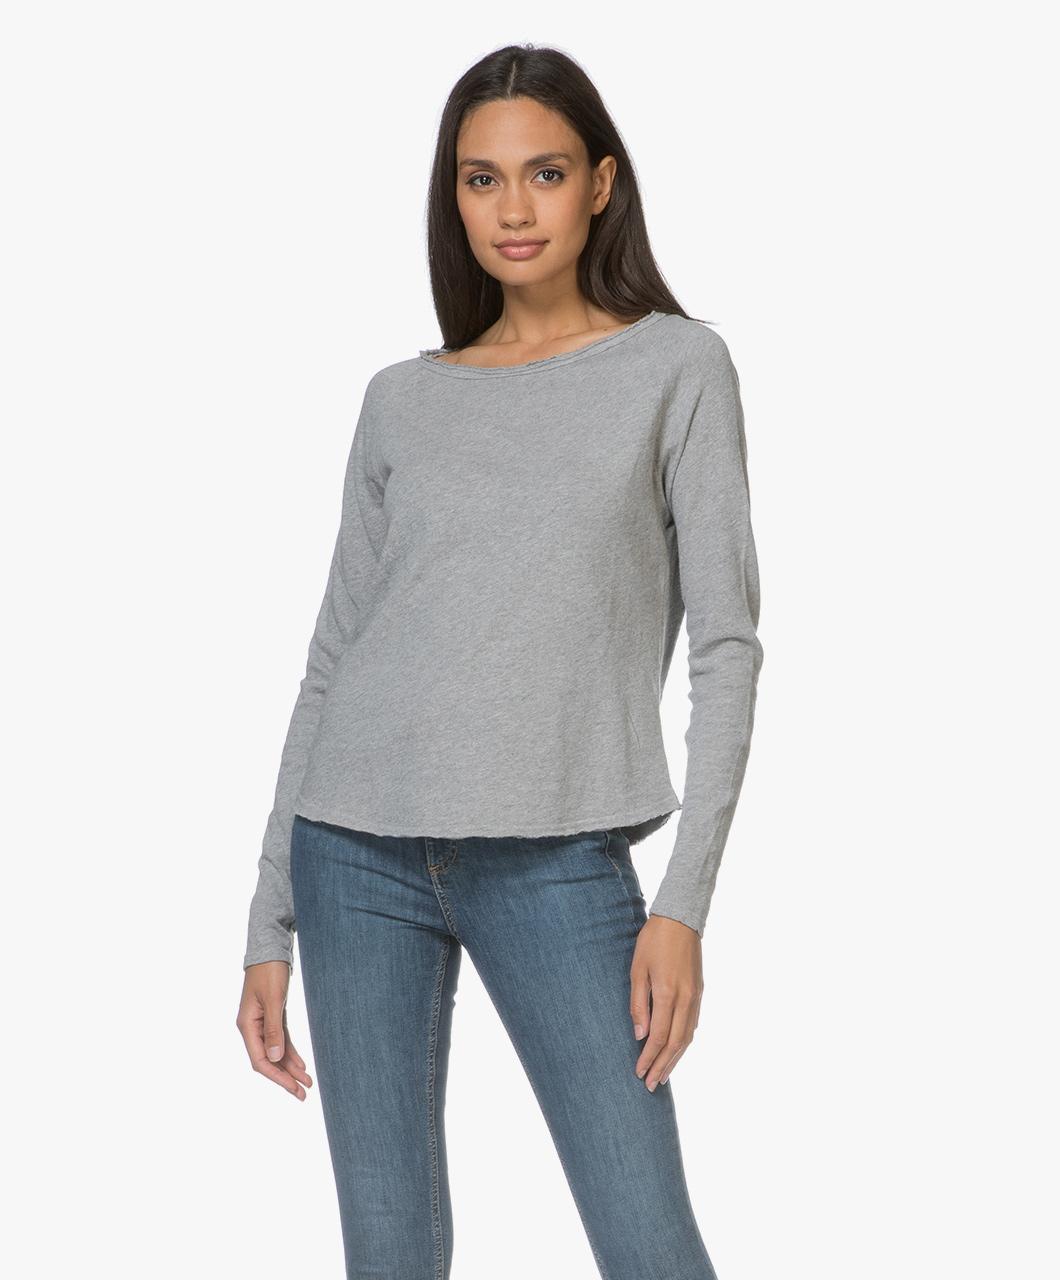 Obrázek American Sweater Vintage Sonoma in Grey Melange